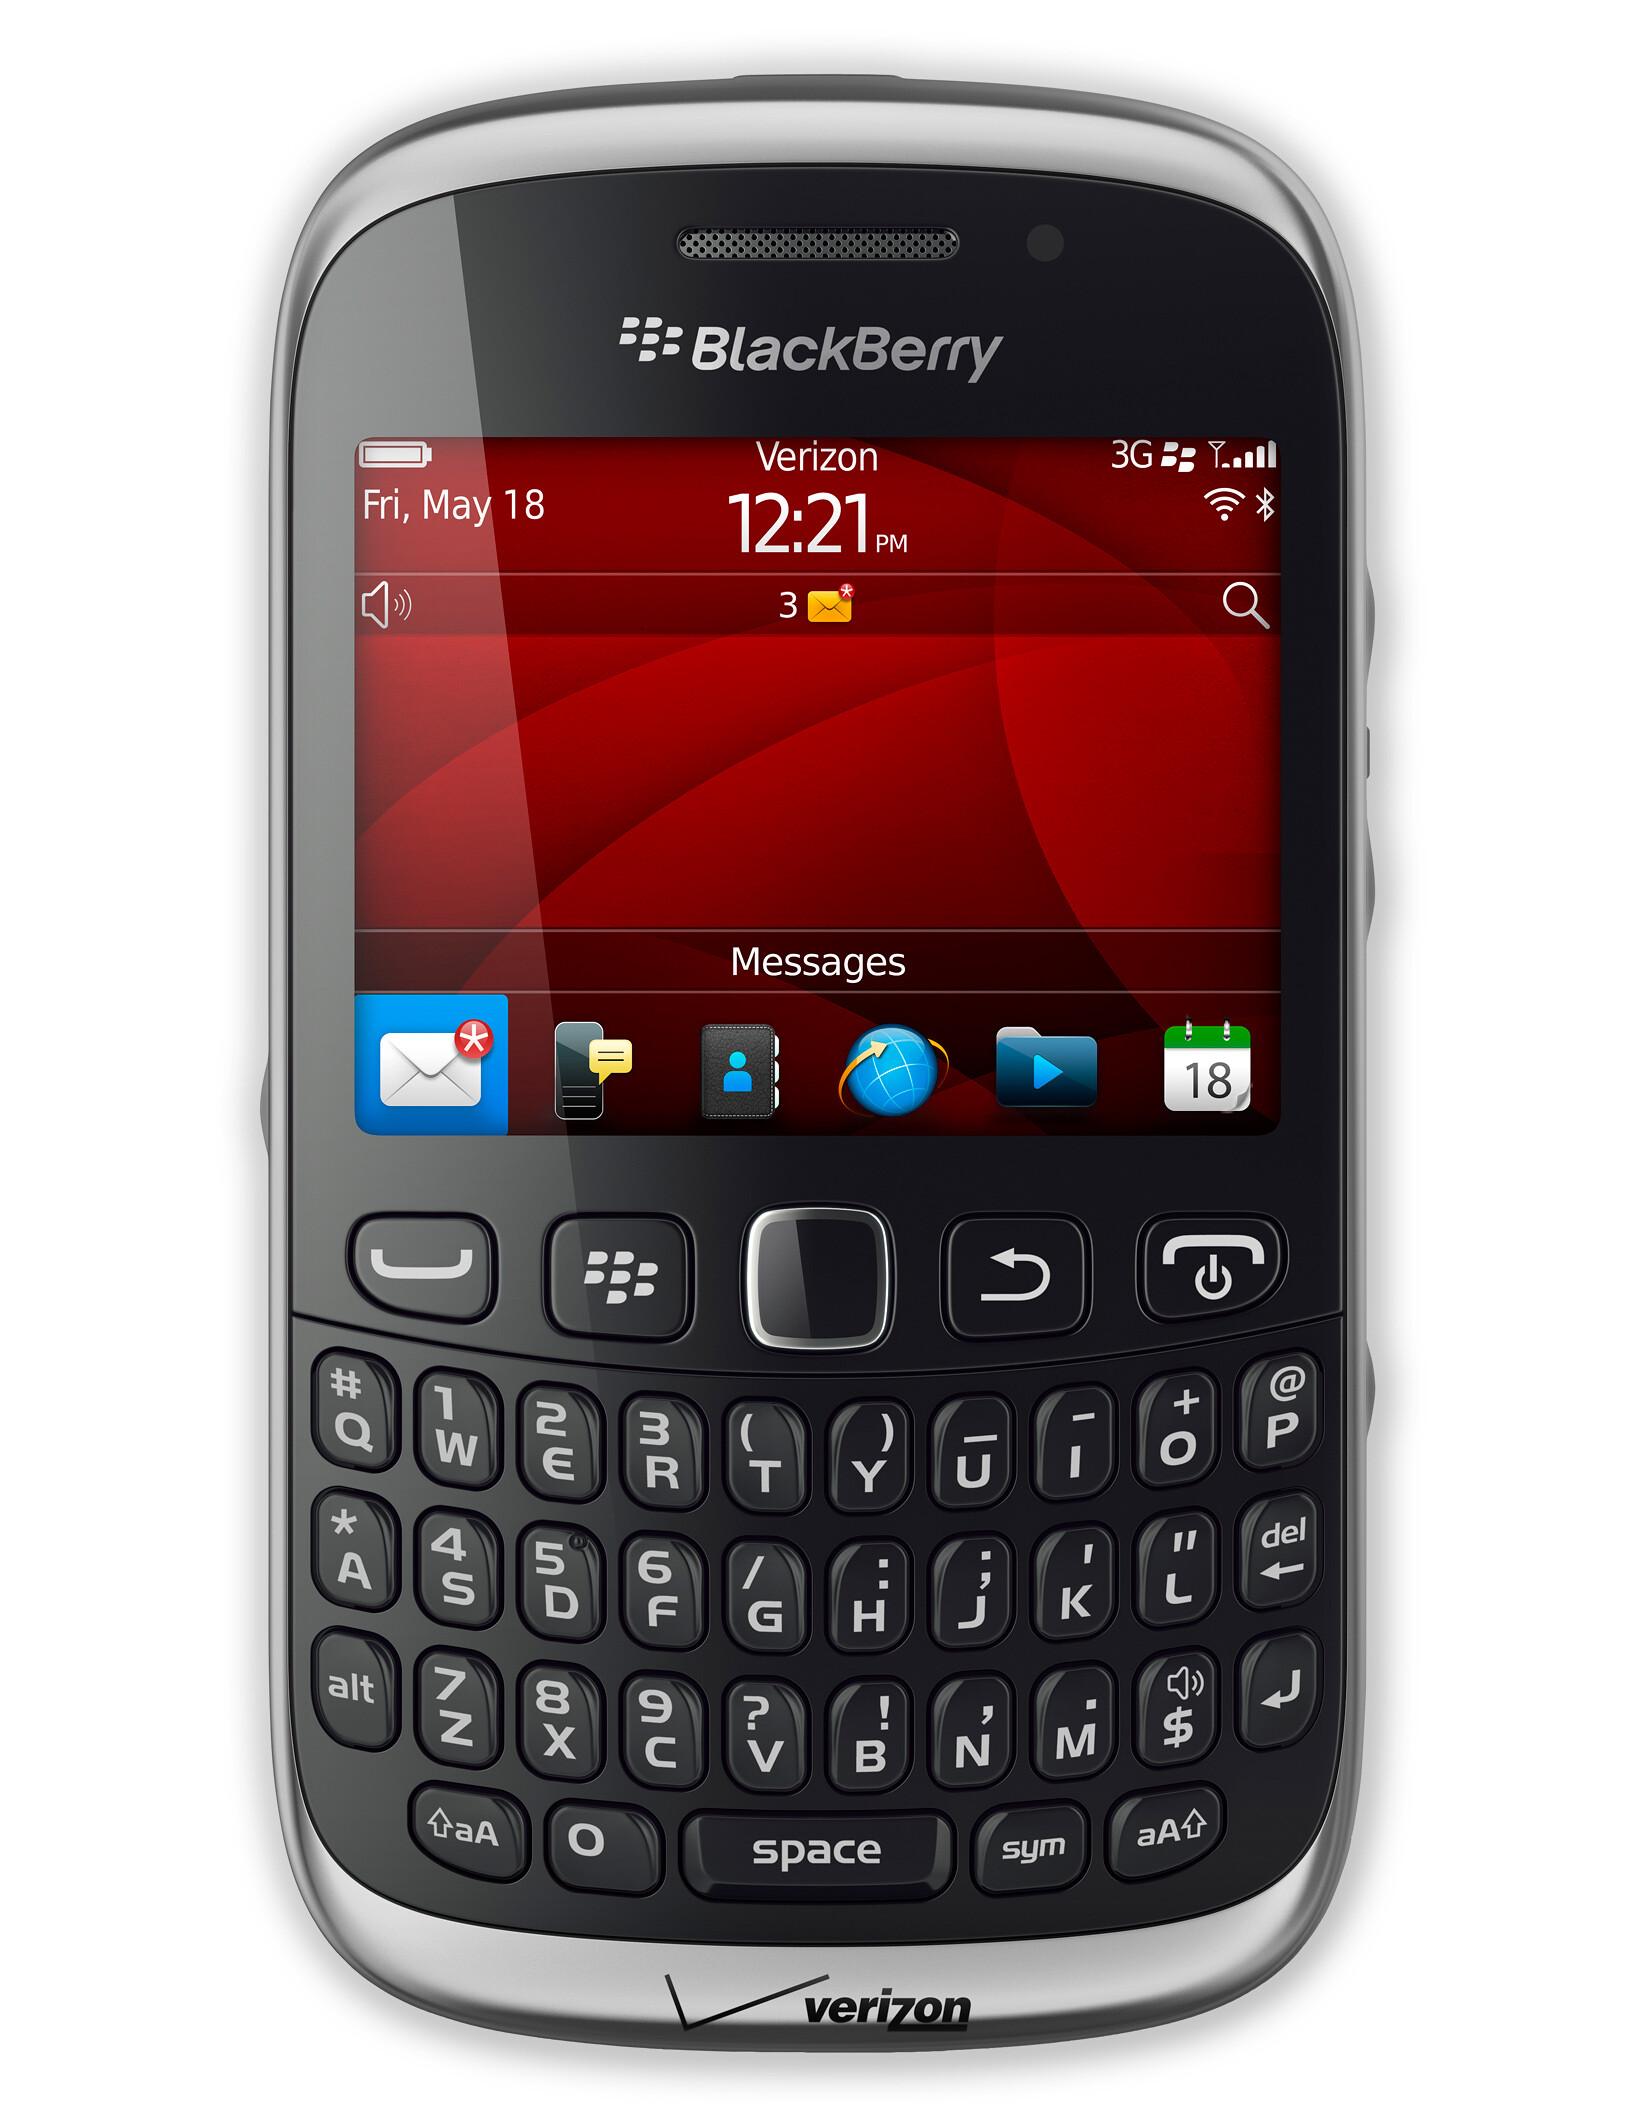 BlackBerry Curve 9310 full specs